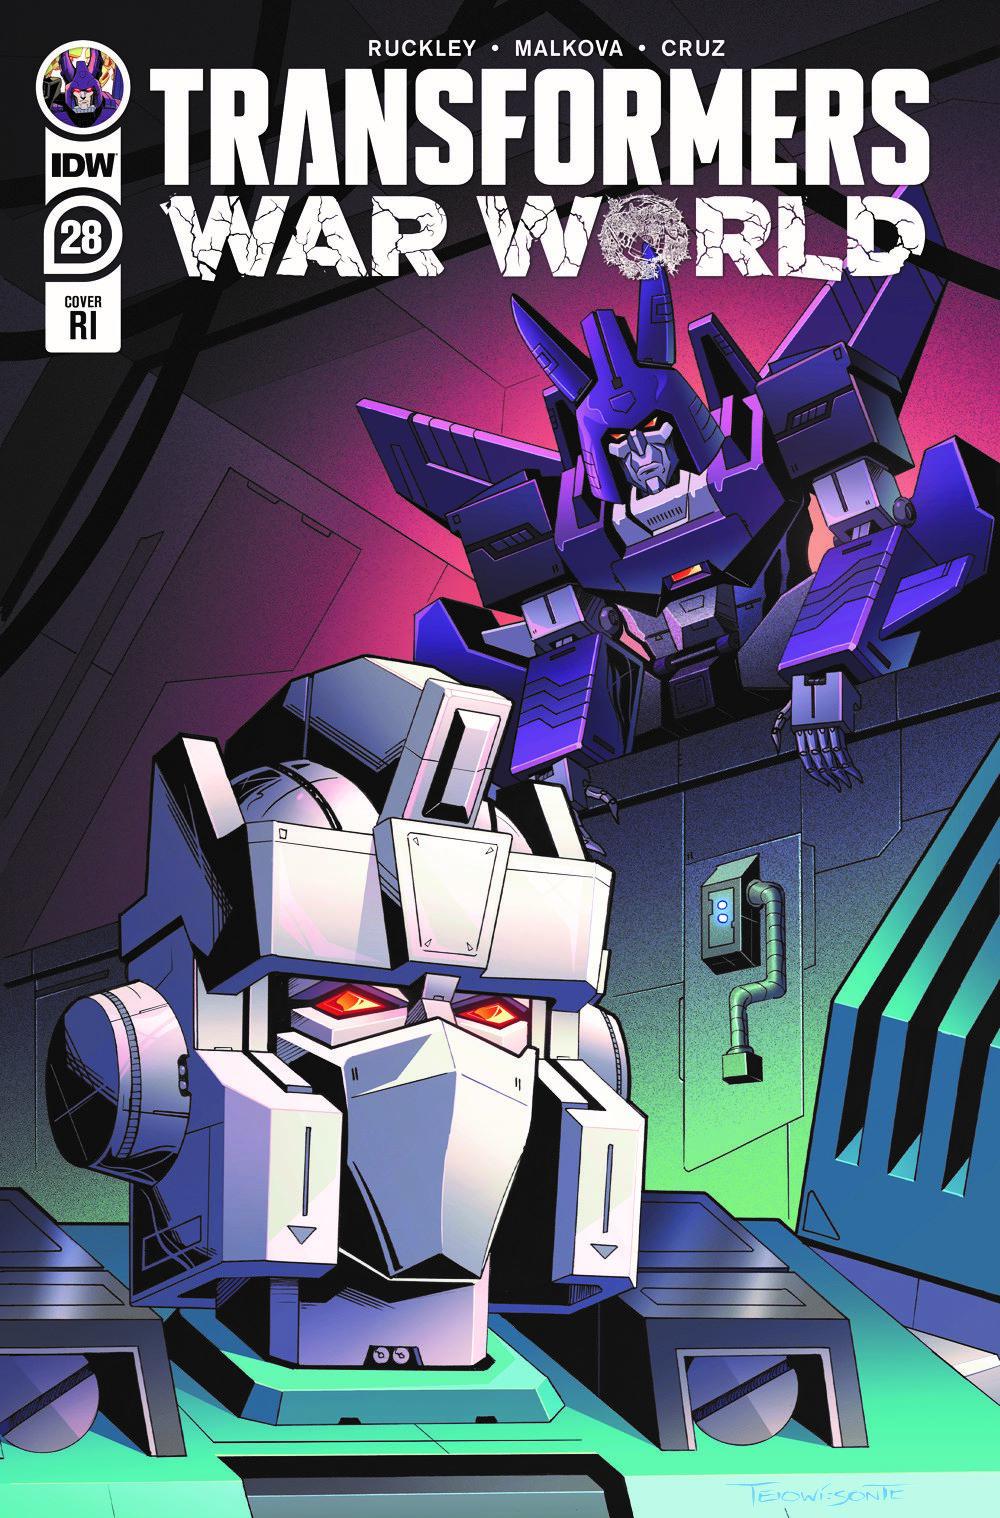 TF28-cvr-RI ComicList: IDW Publishing New Releases for 03/31/2021